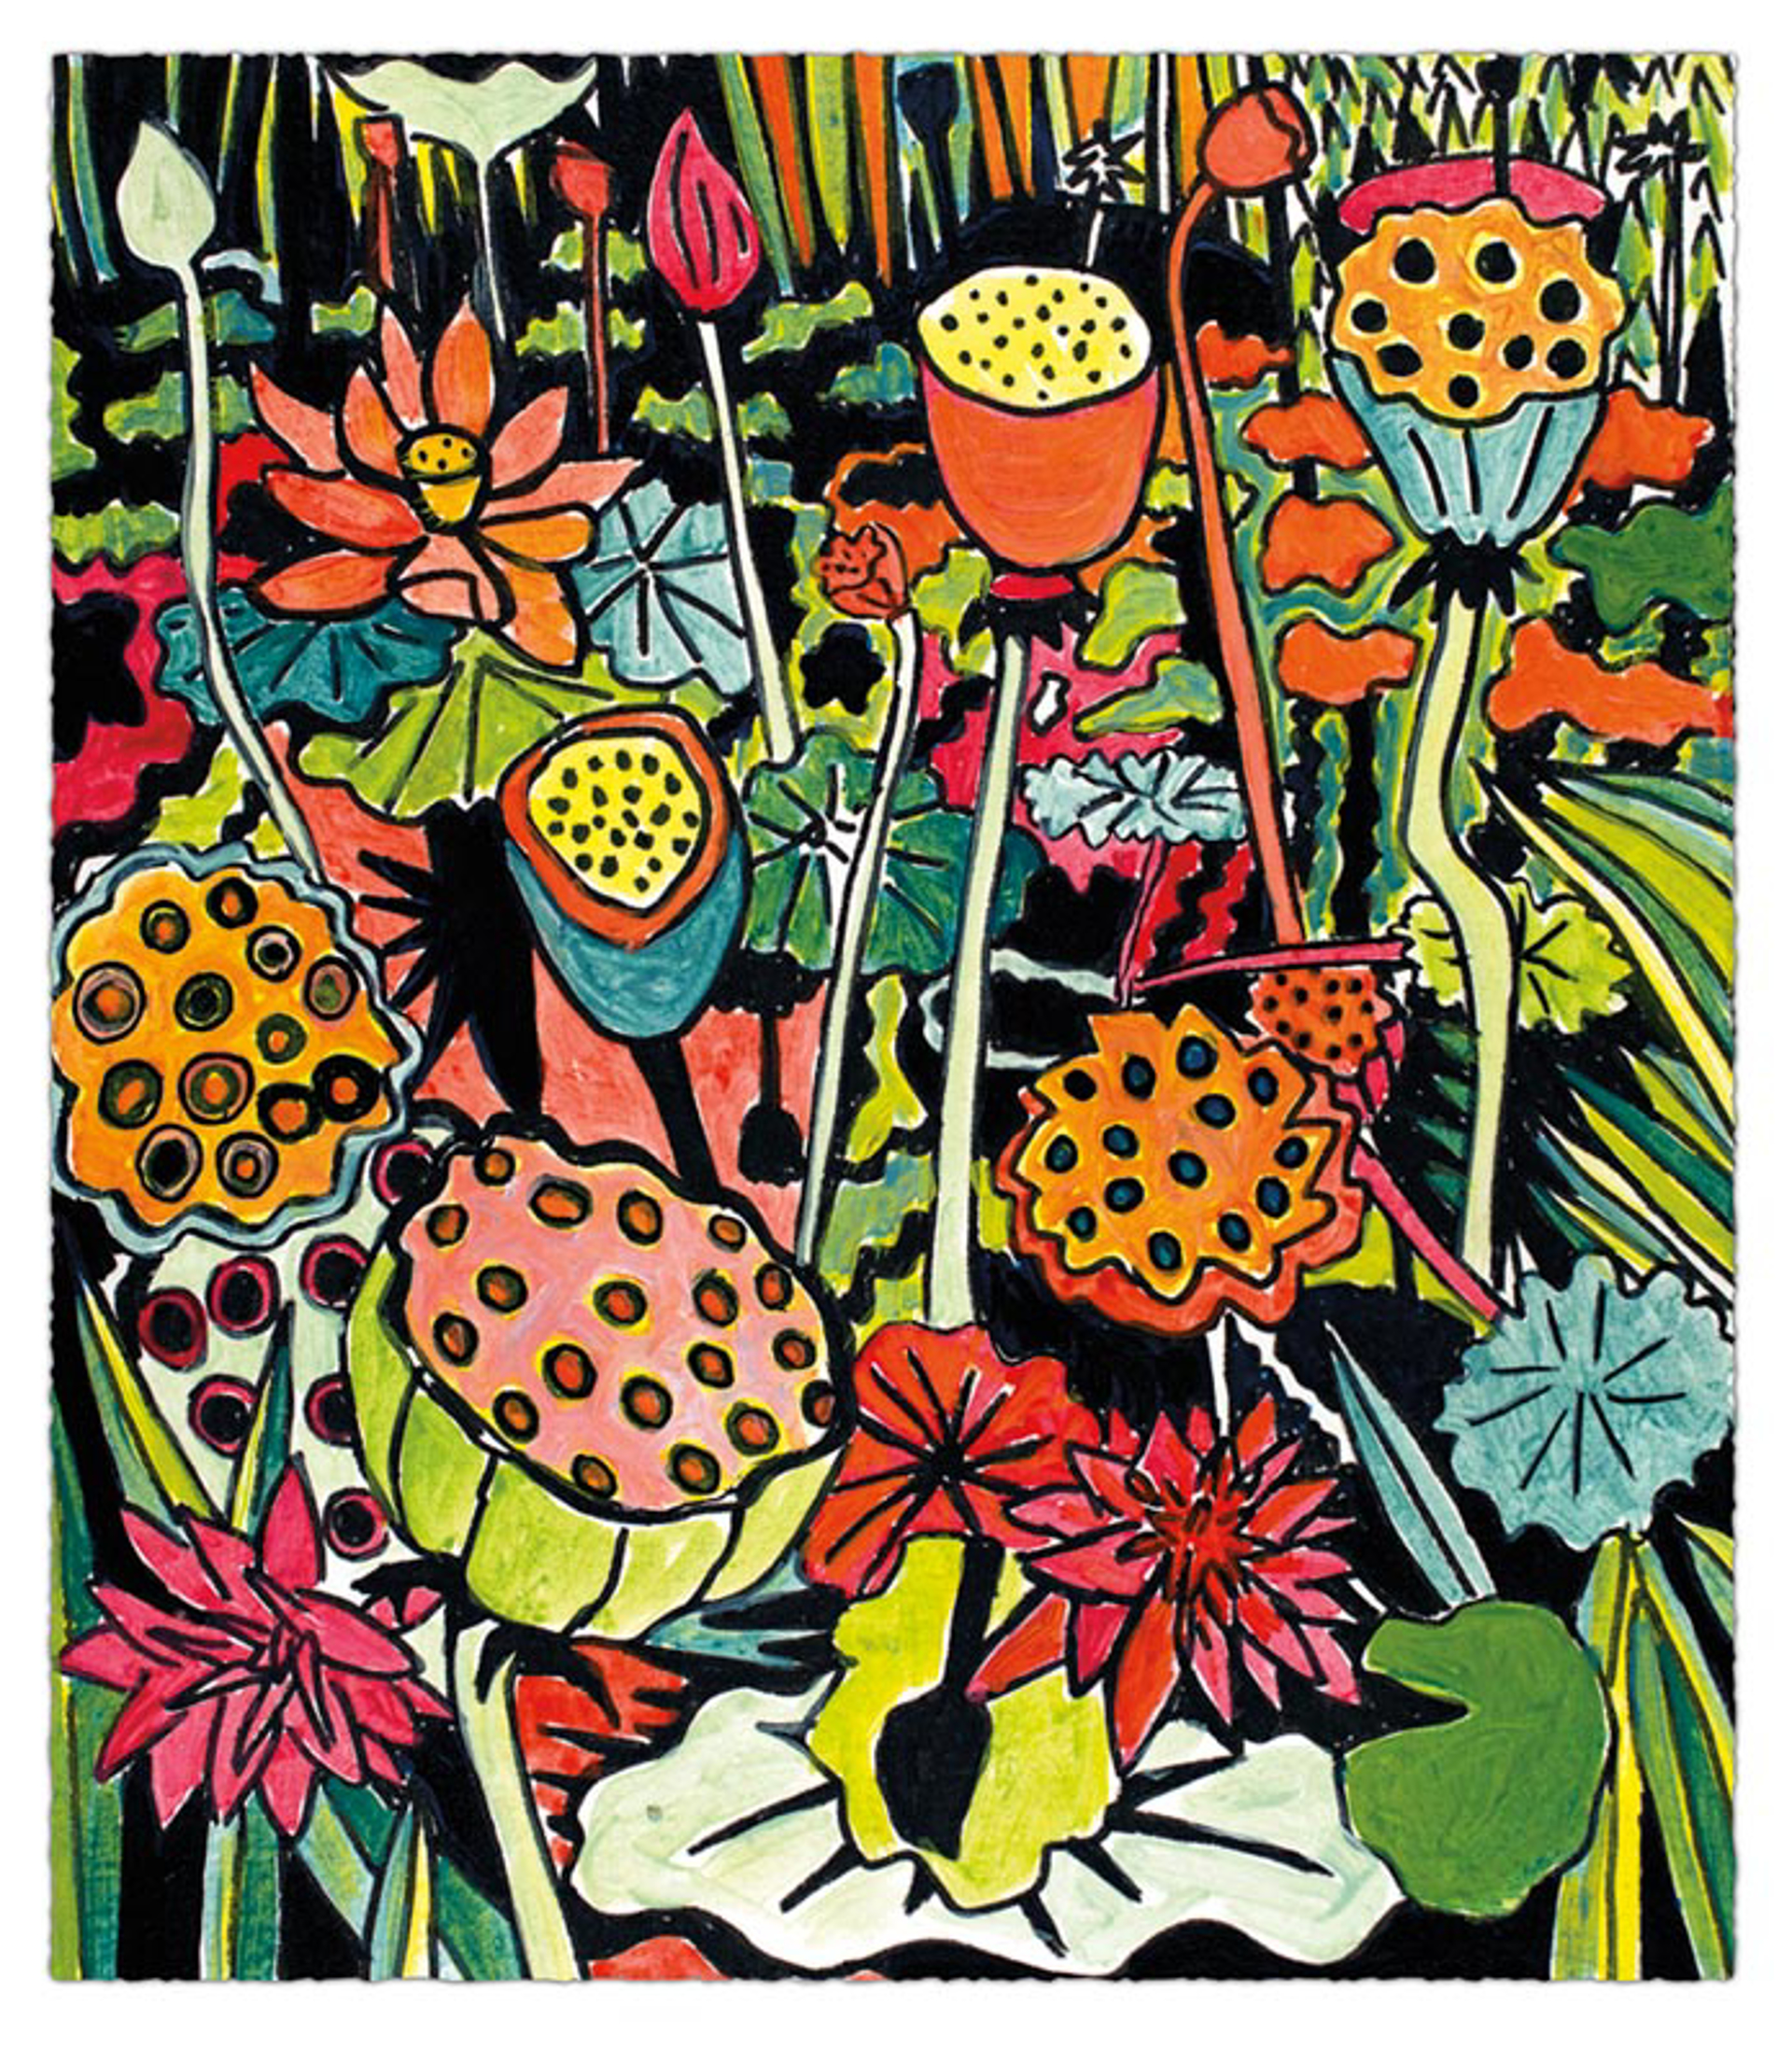 Lotusland 1 by Rebecca Hermann